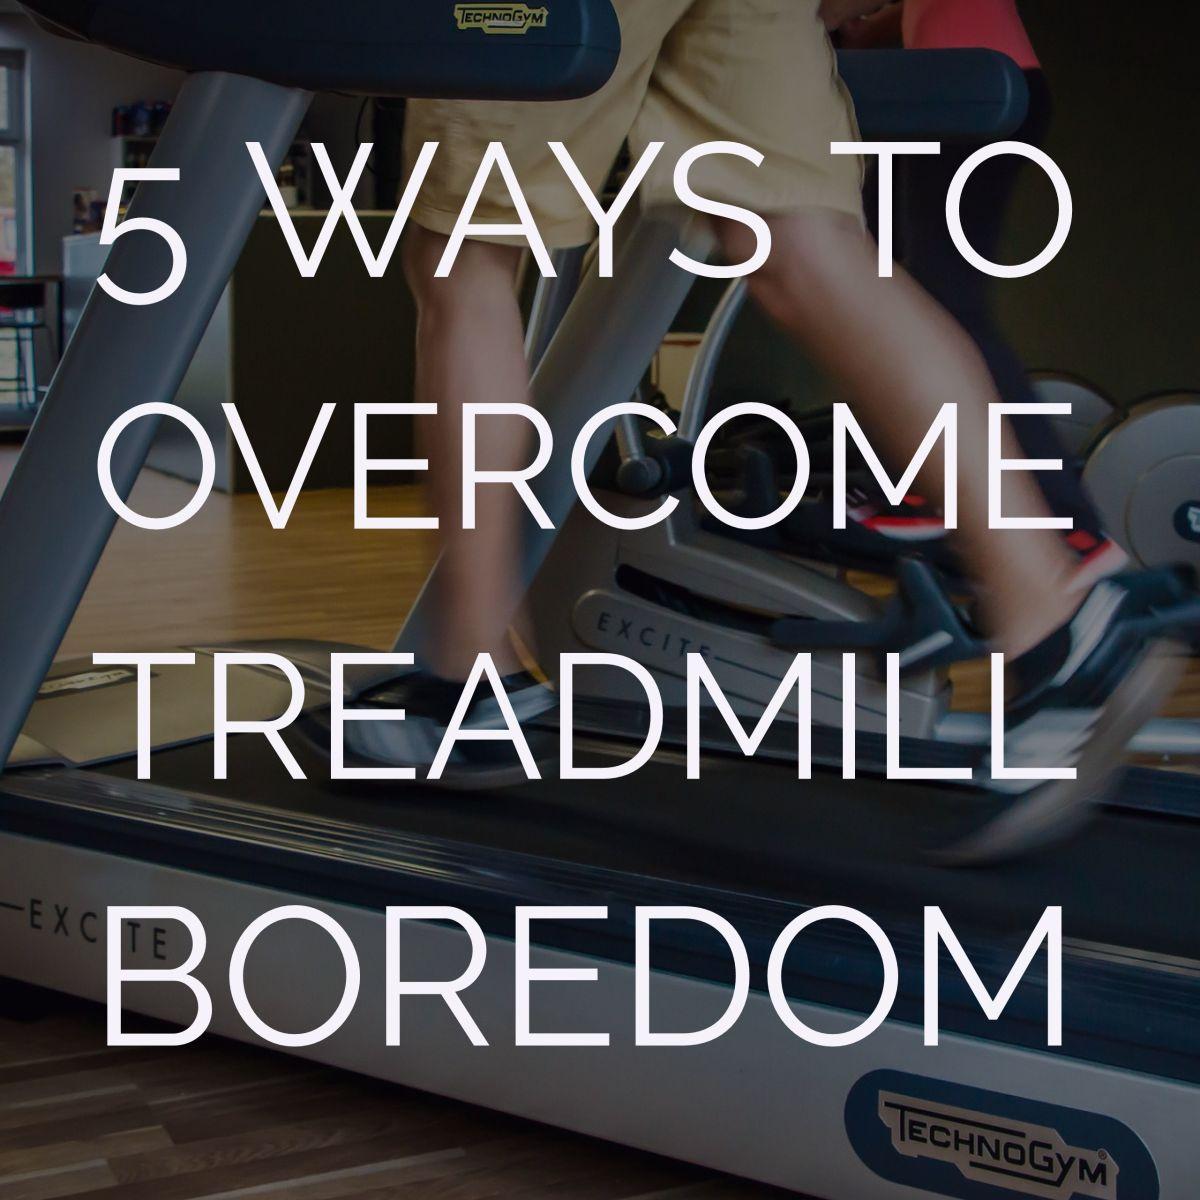 5 Ways to Overcome Treadmill Boredom